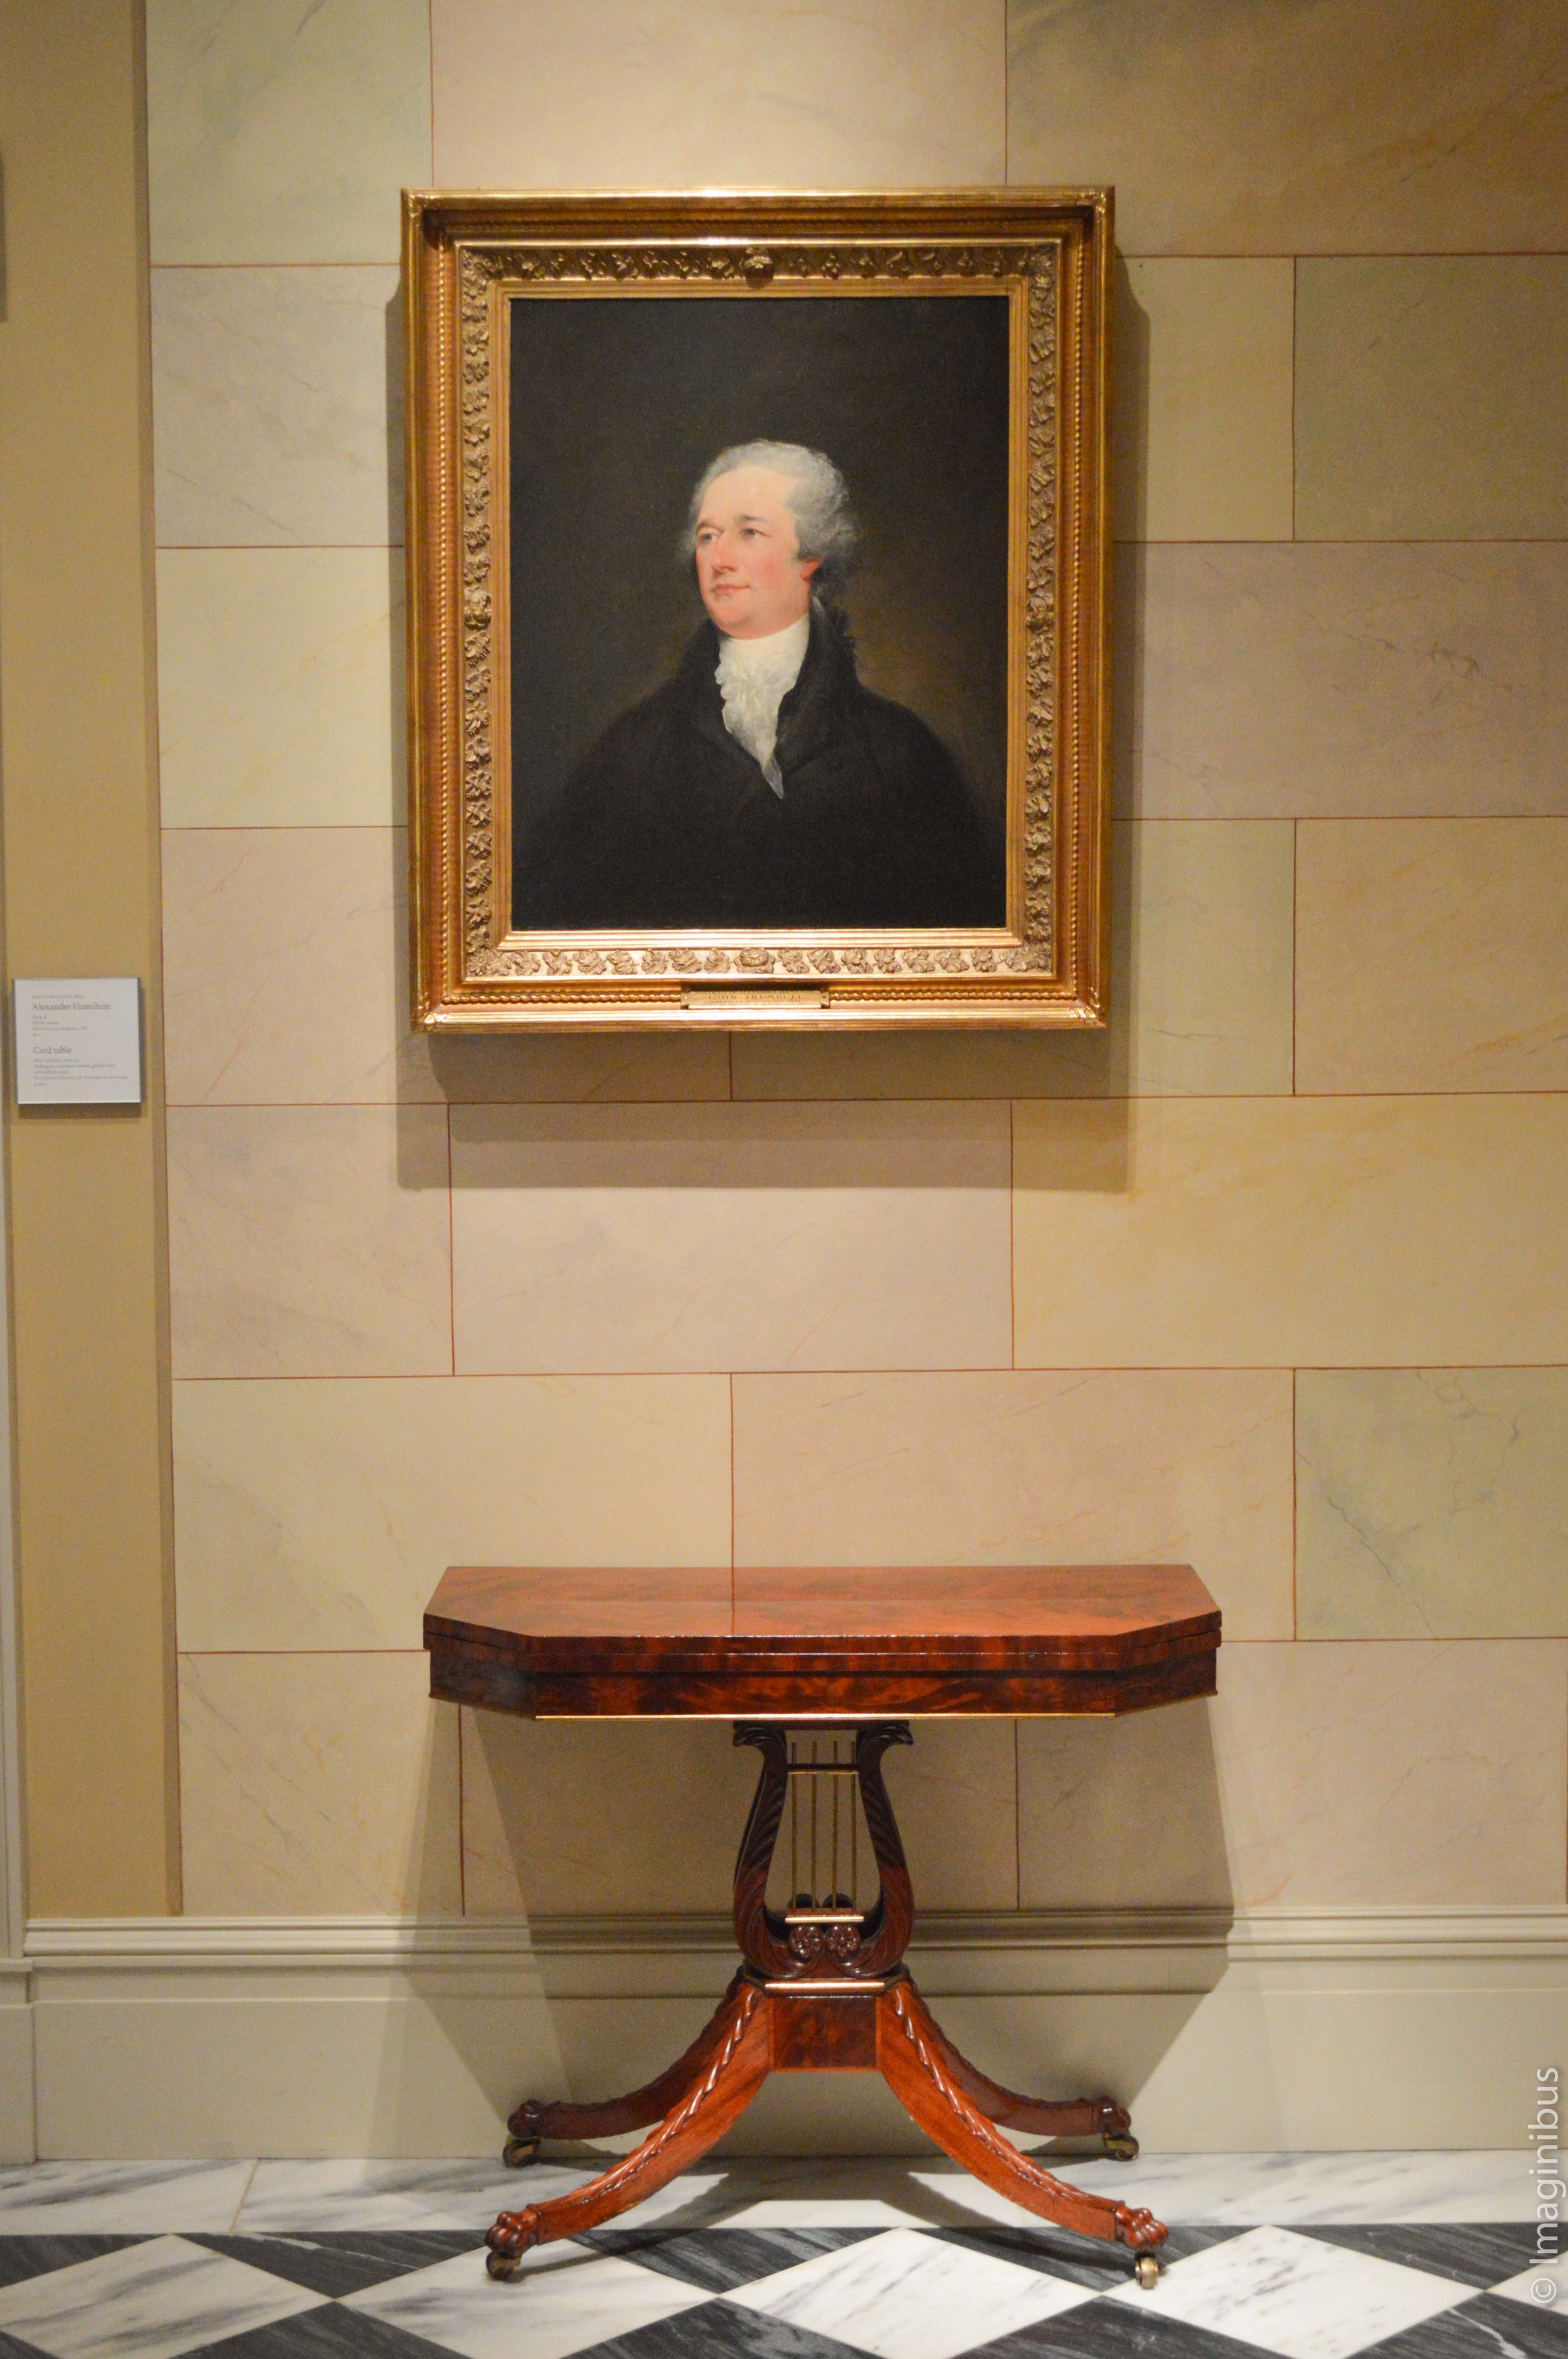 Alexander Hamilton, John Trumbull, Metropolitan Museum